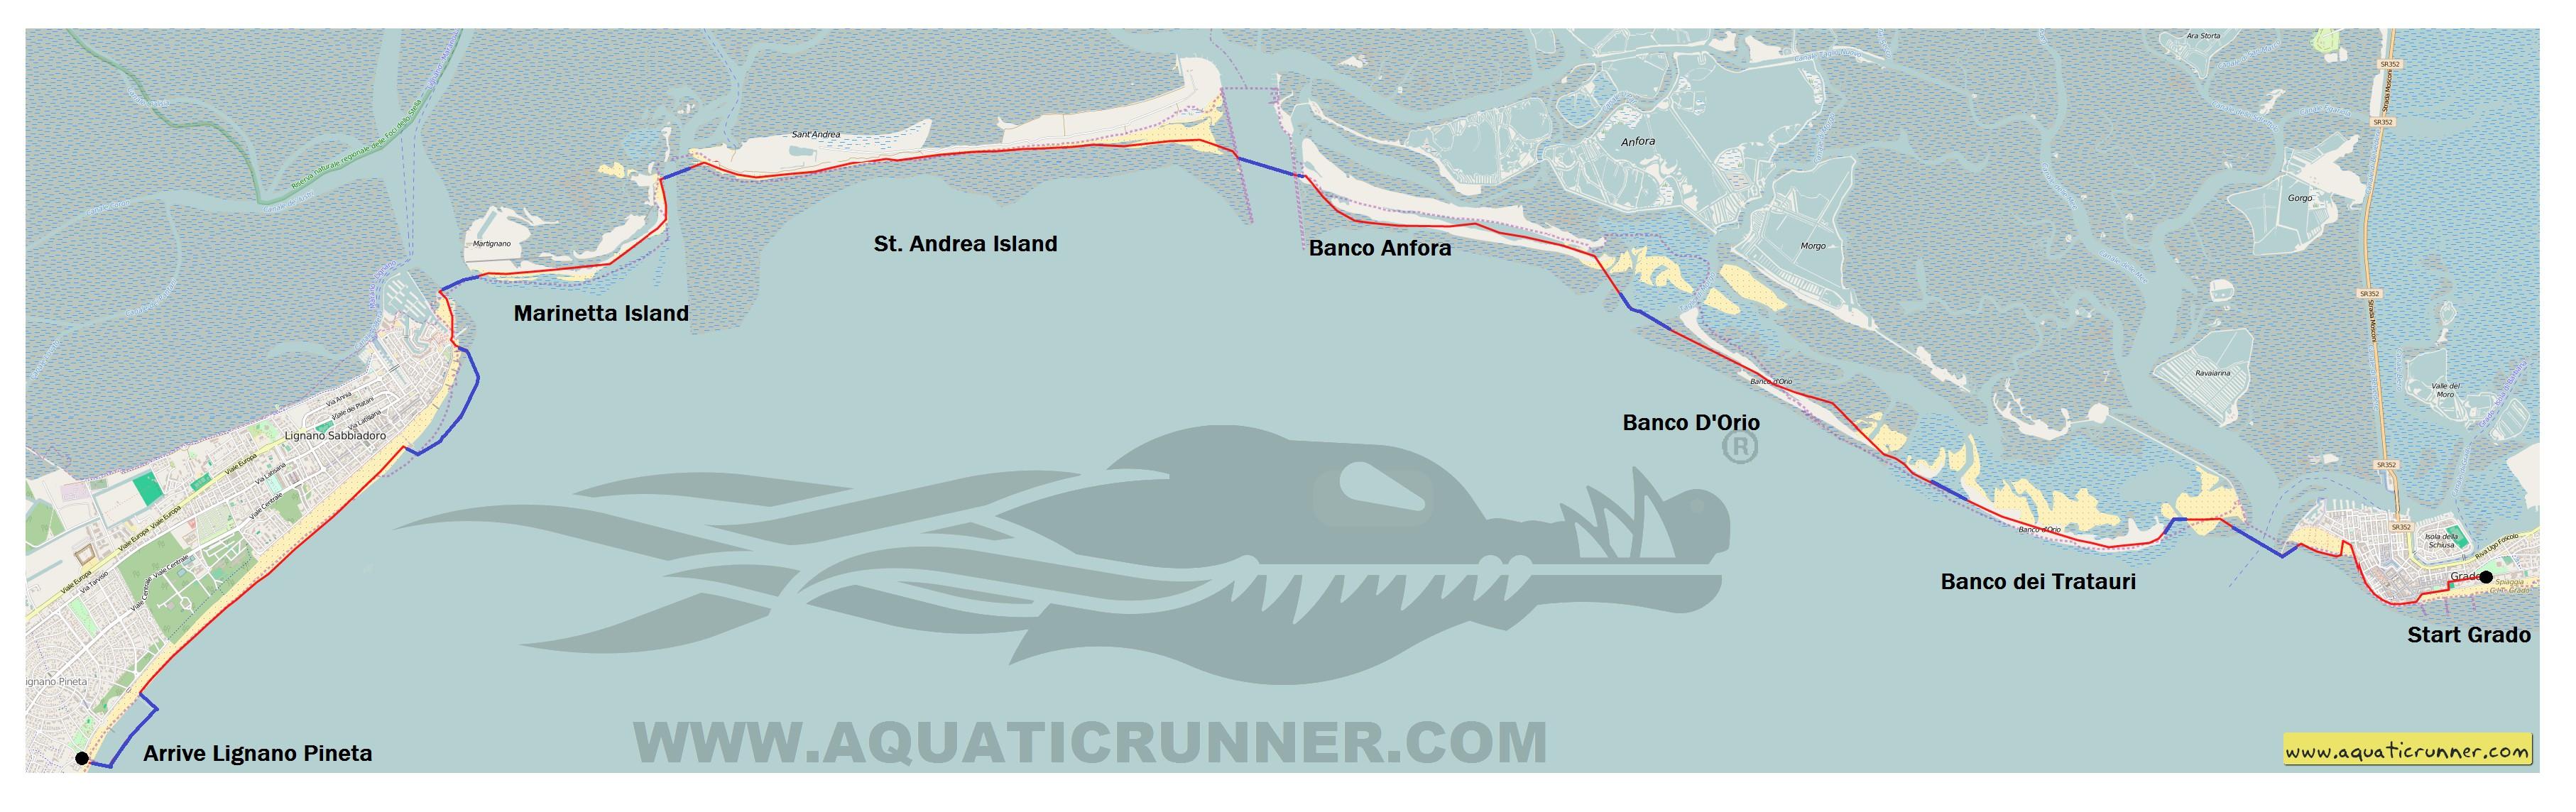 aquatic-runner-map